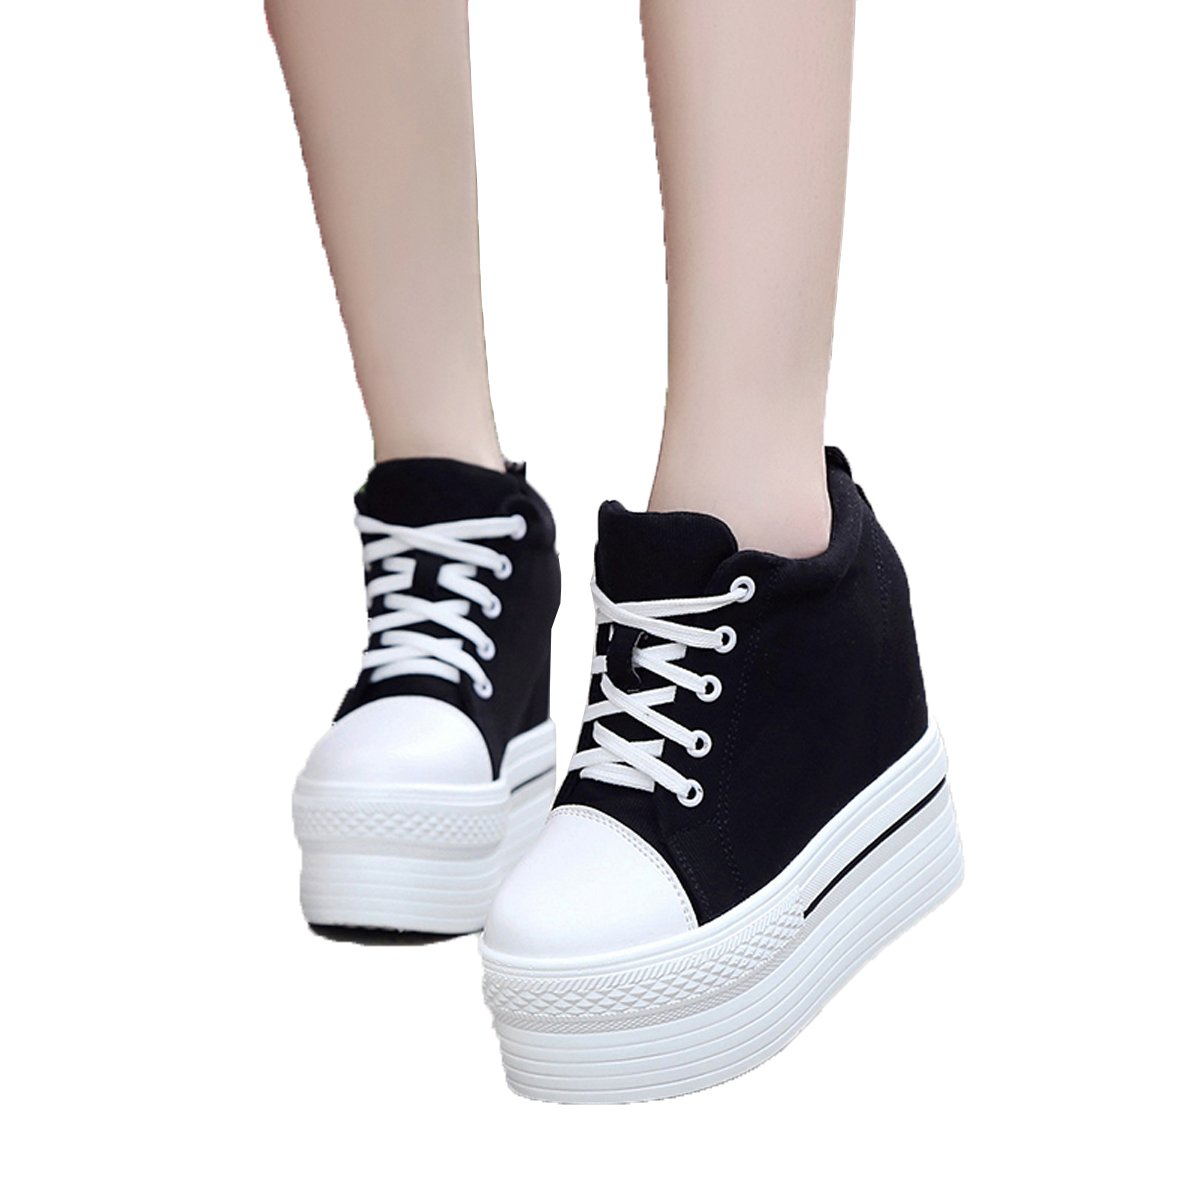 YC WELL Womens Wedge Platform Sneaker Flat Canvas Shoes Lace up Platform Sneakers B01L3JQ3SY 6.5 B(M) US|Black